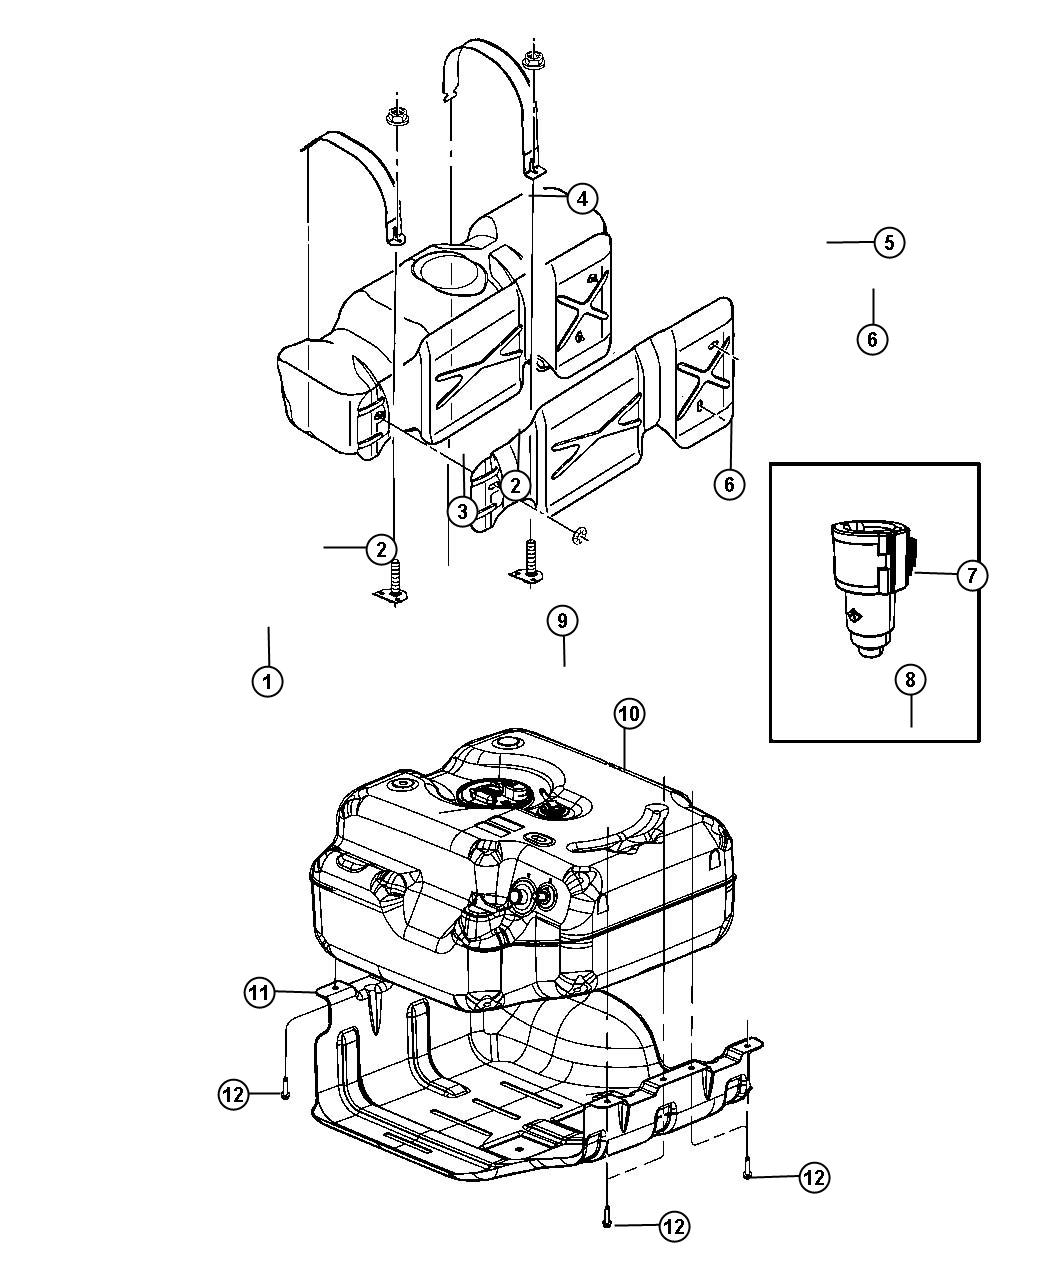 Ram Tube Fuel Vapor 52 Gallon Rear Fuel Tank